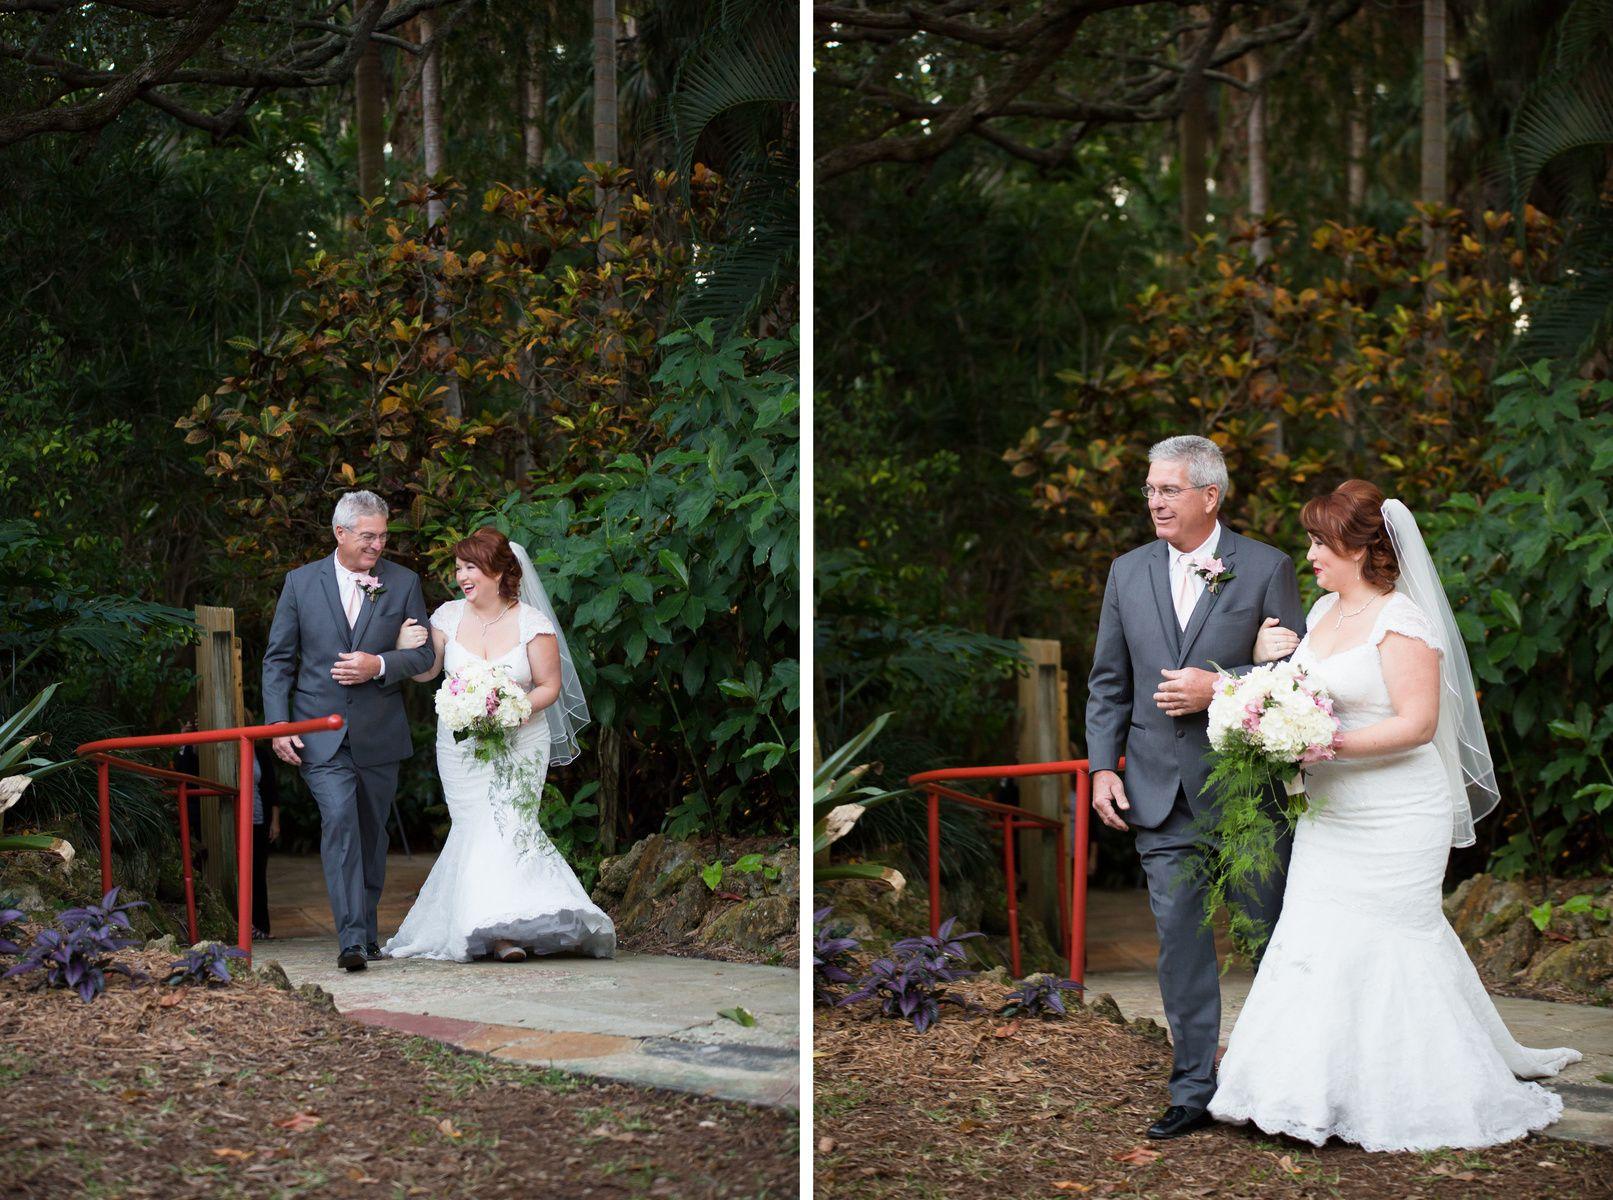 Rachel S Portfolio Rachel Lamb Photography Blog Thea And Jimmy Wedding Blog Photography Rachel Lamb Wedding